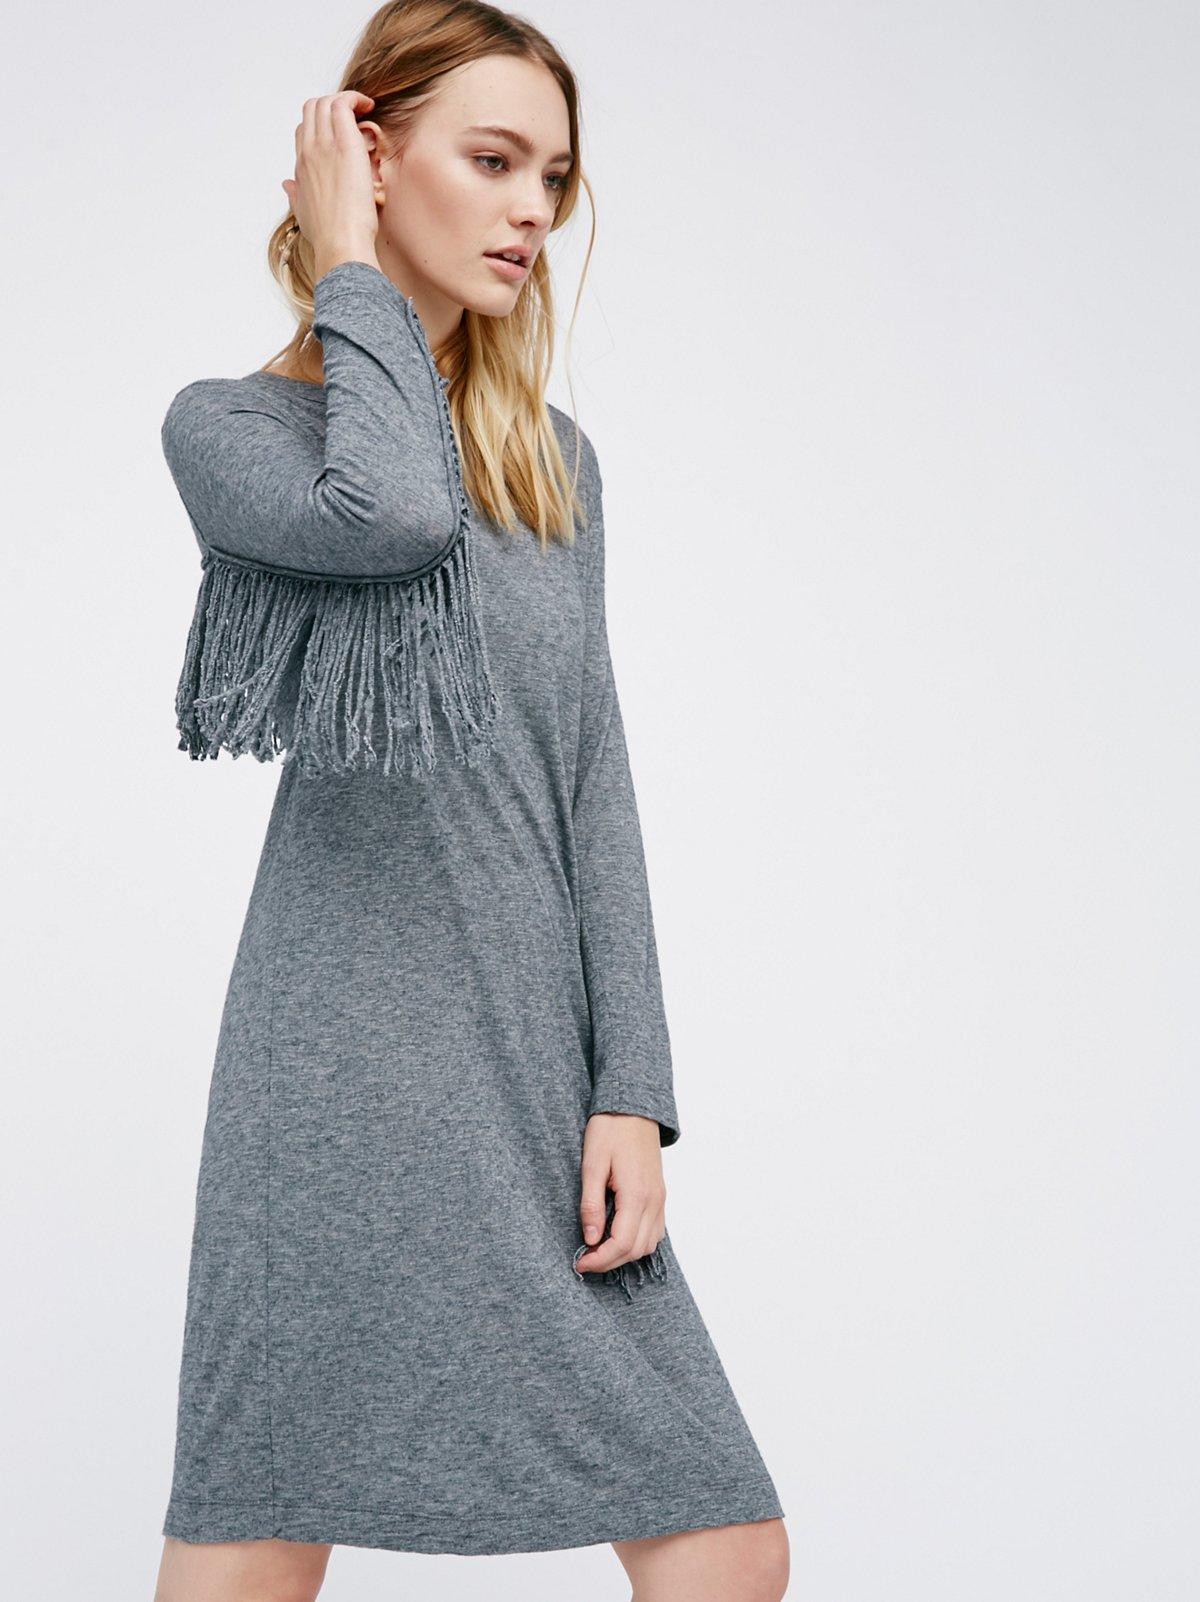 Winter Fringe T-Shirt Dress